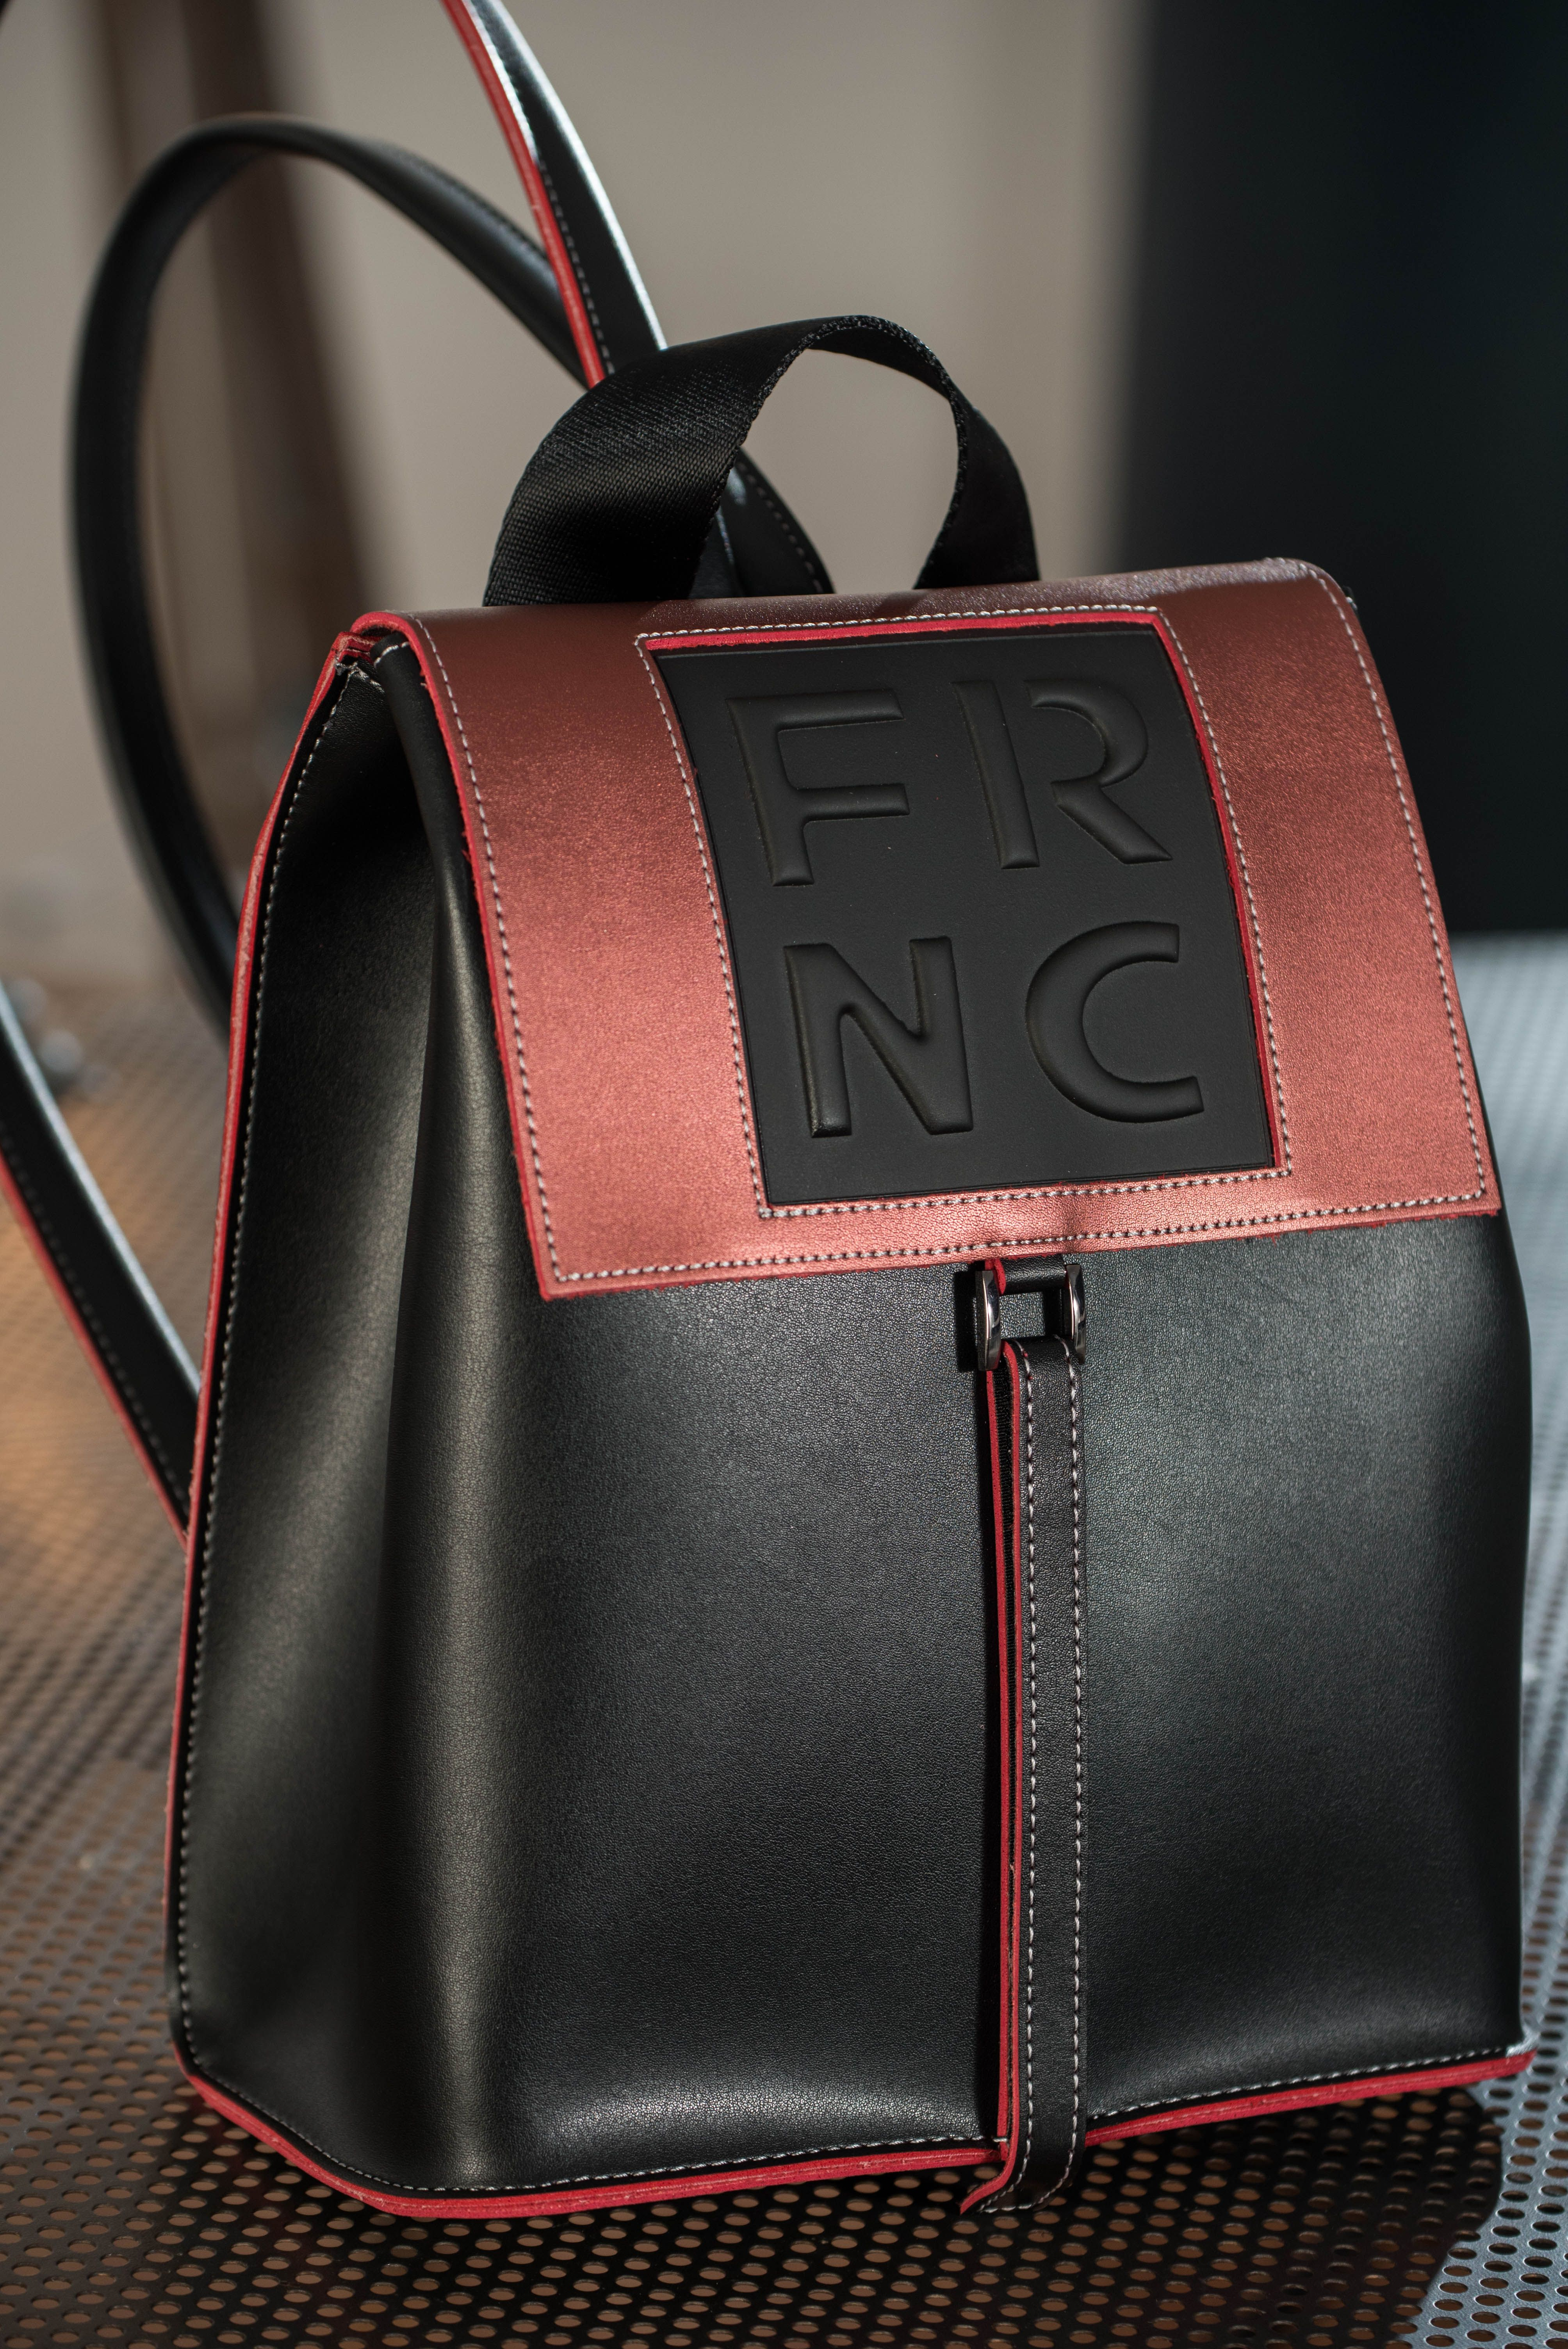 frnc  frnc bags  bags  4a8e1278dc5